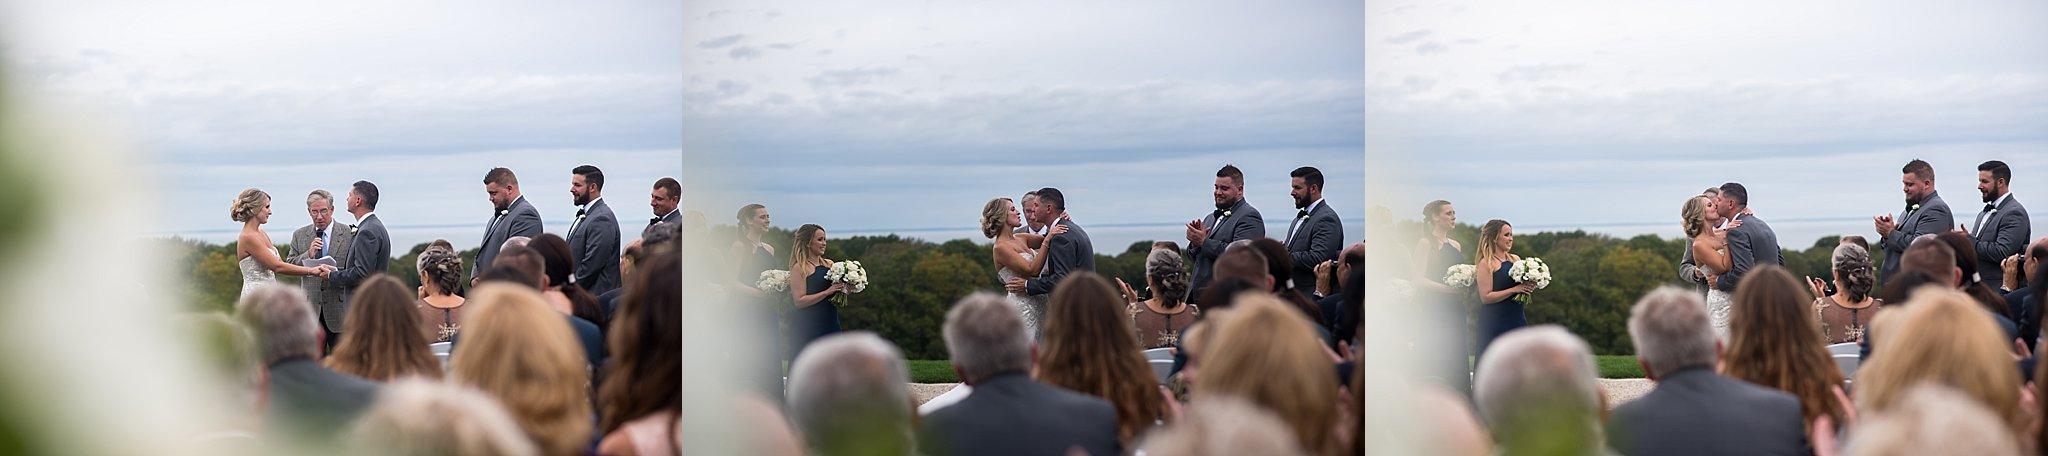 cape cod wedding ceremony.jpg